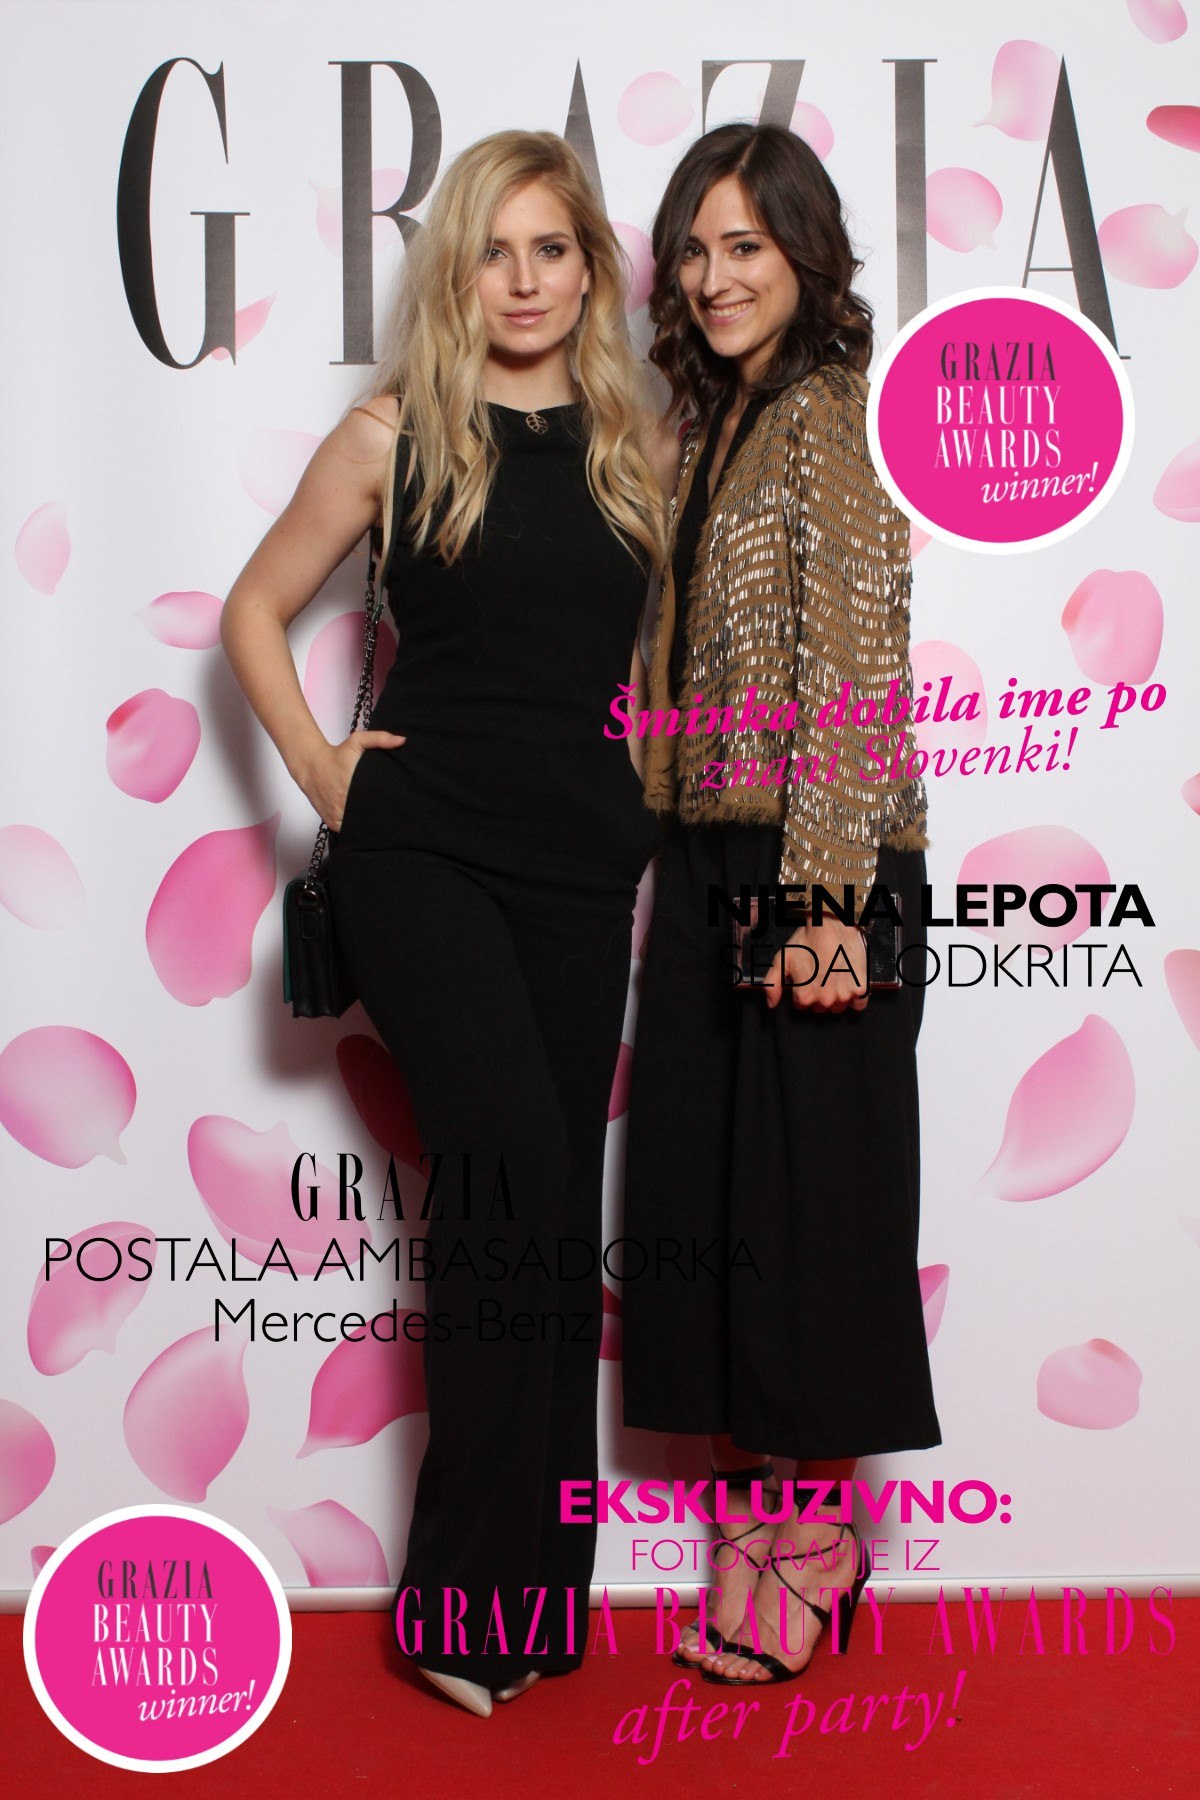 Grazia Beauty Awards